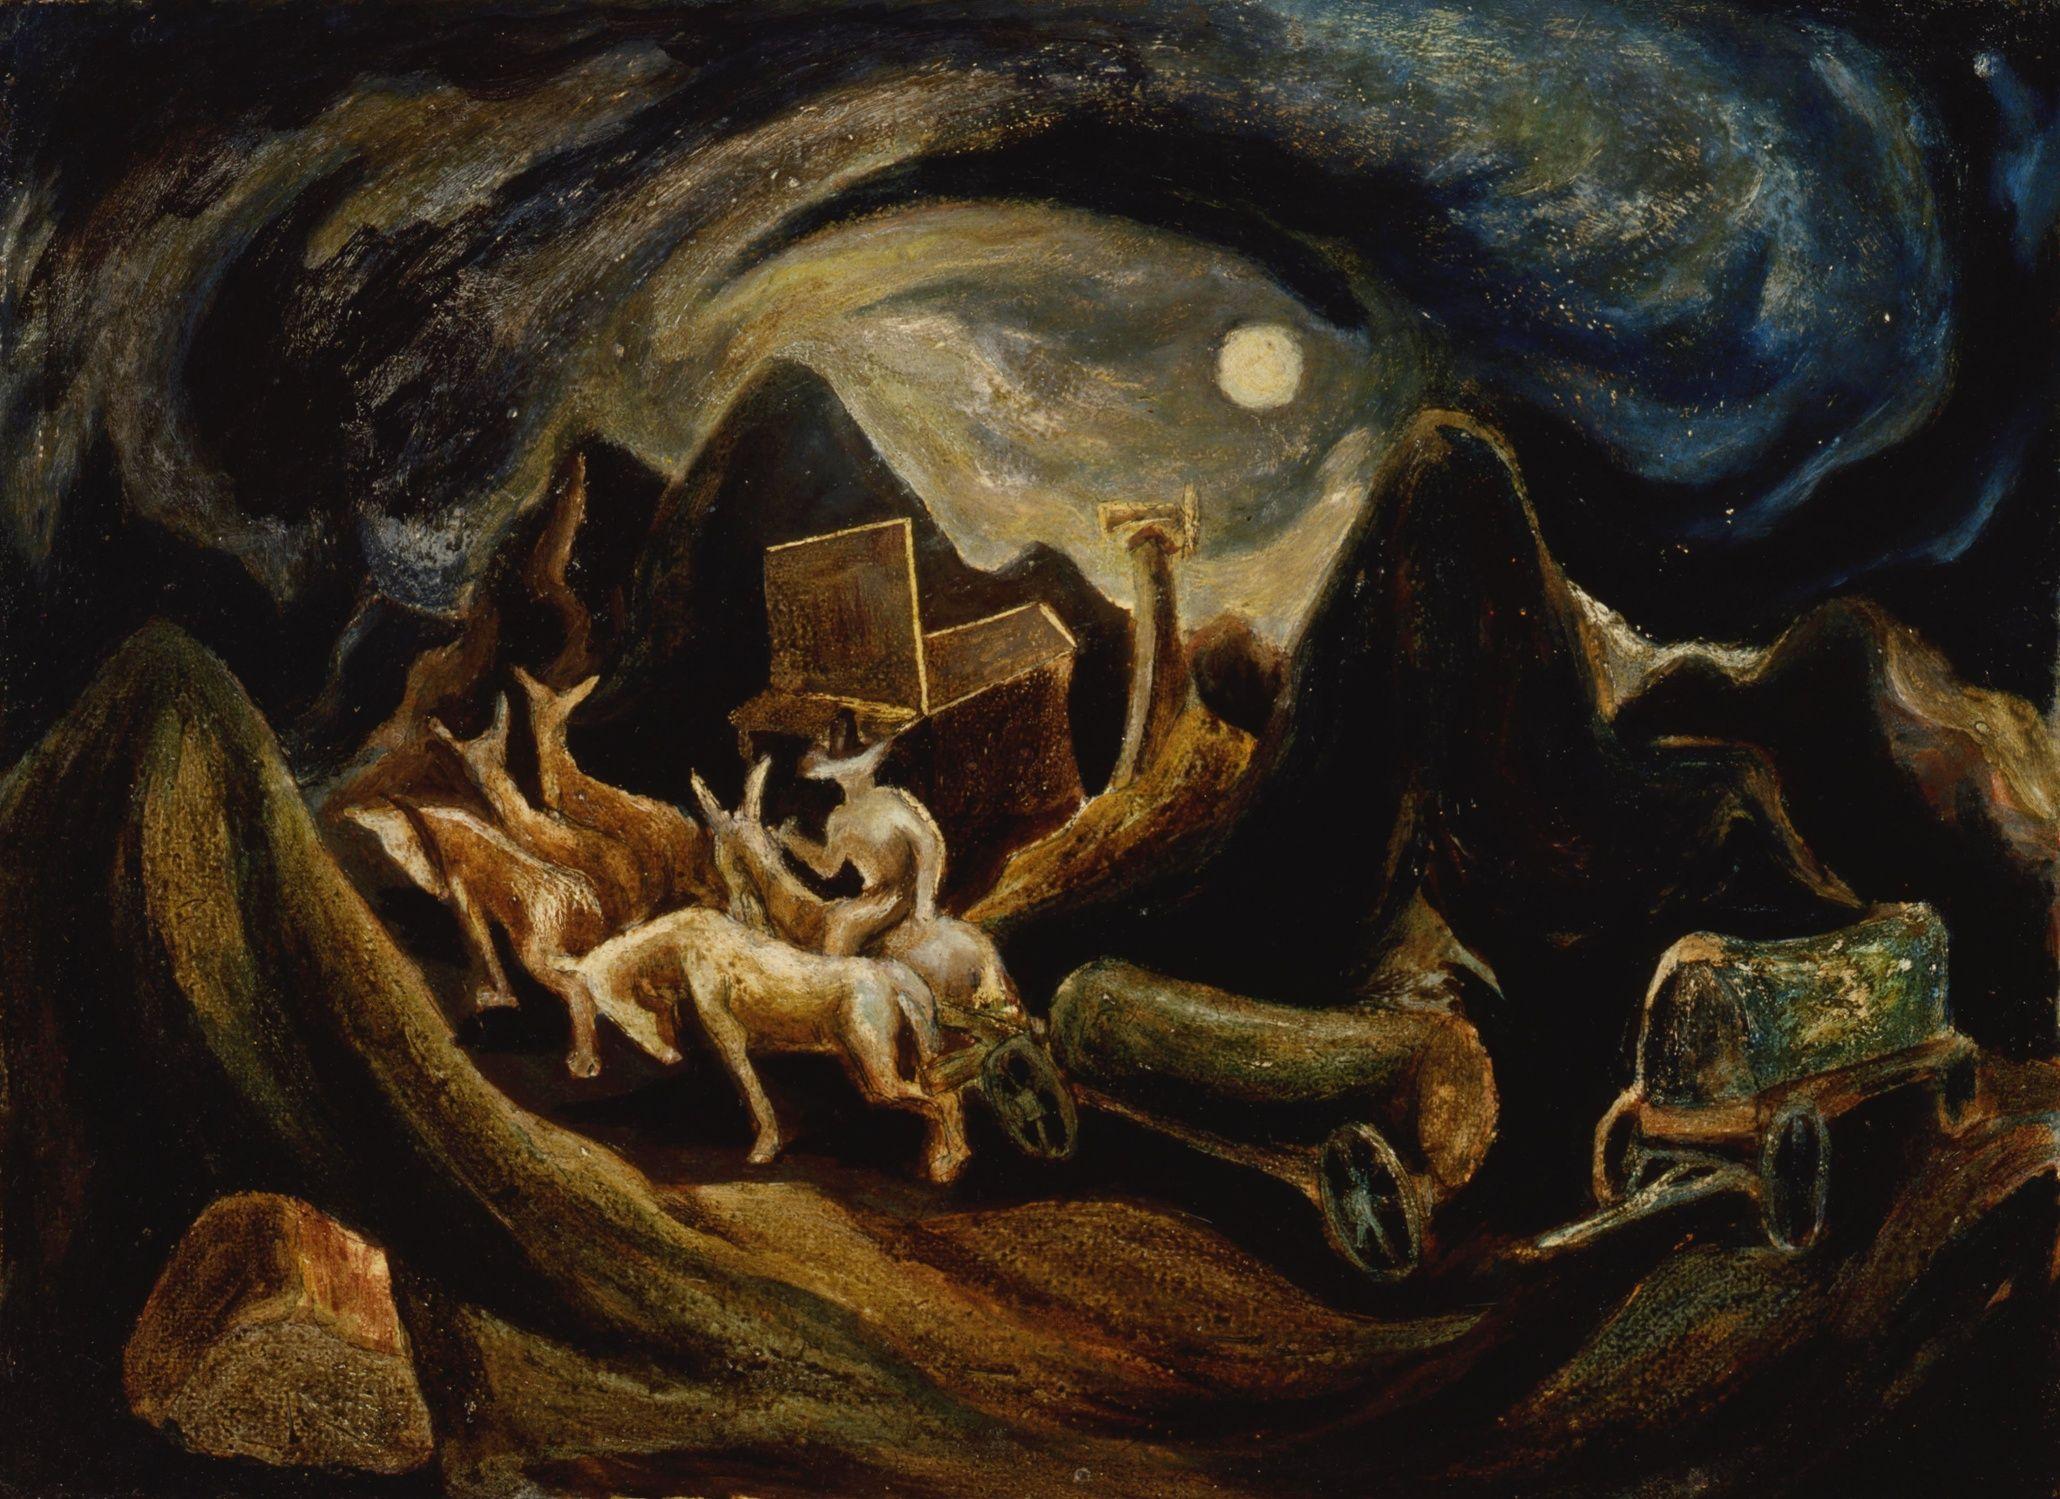 Jackson Pollock, Going West, 19341935